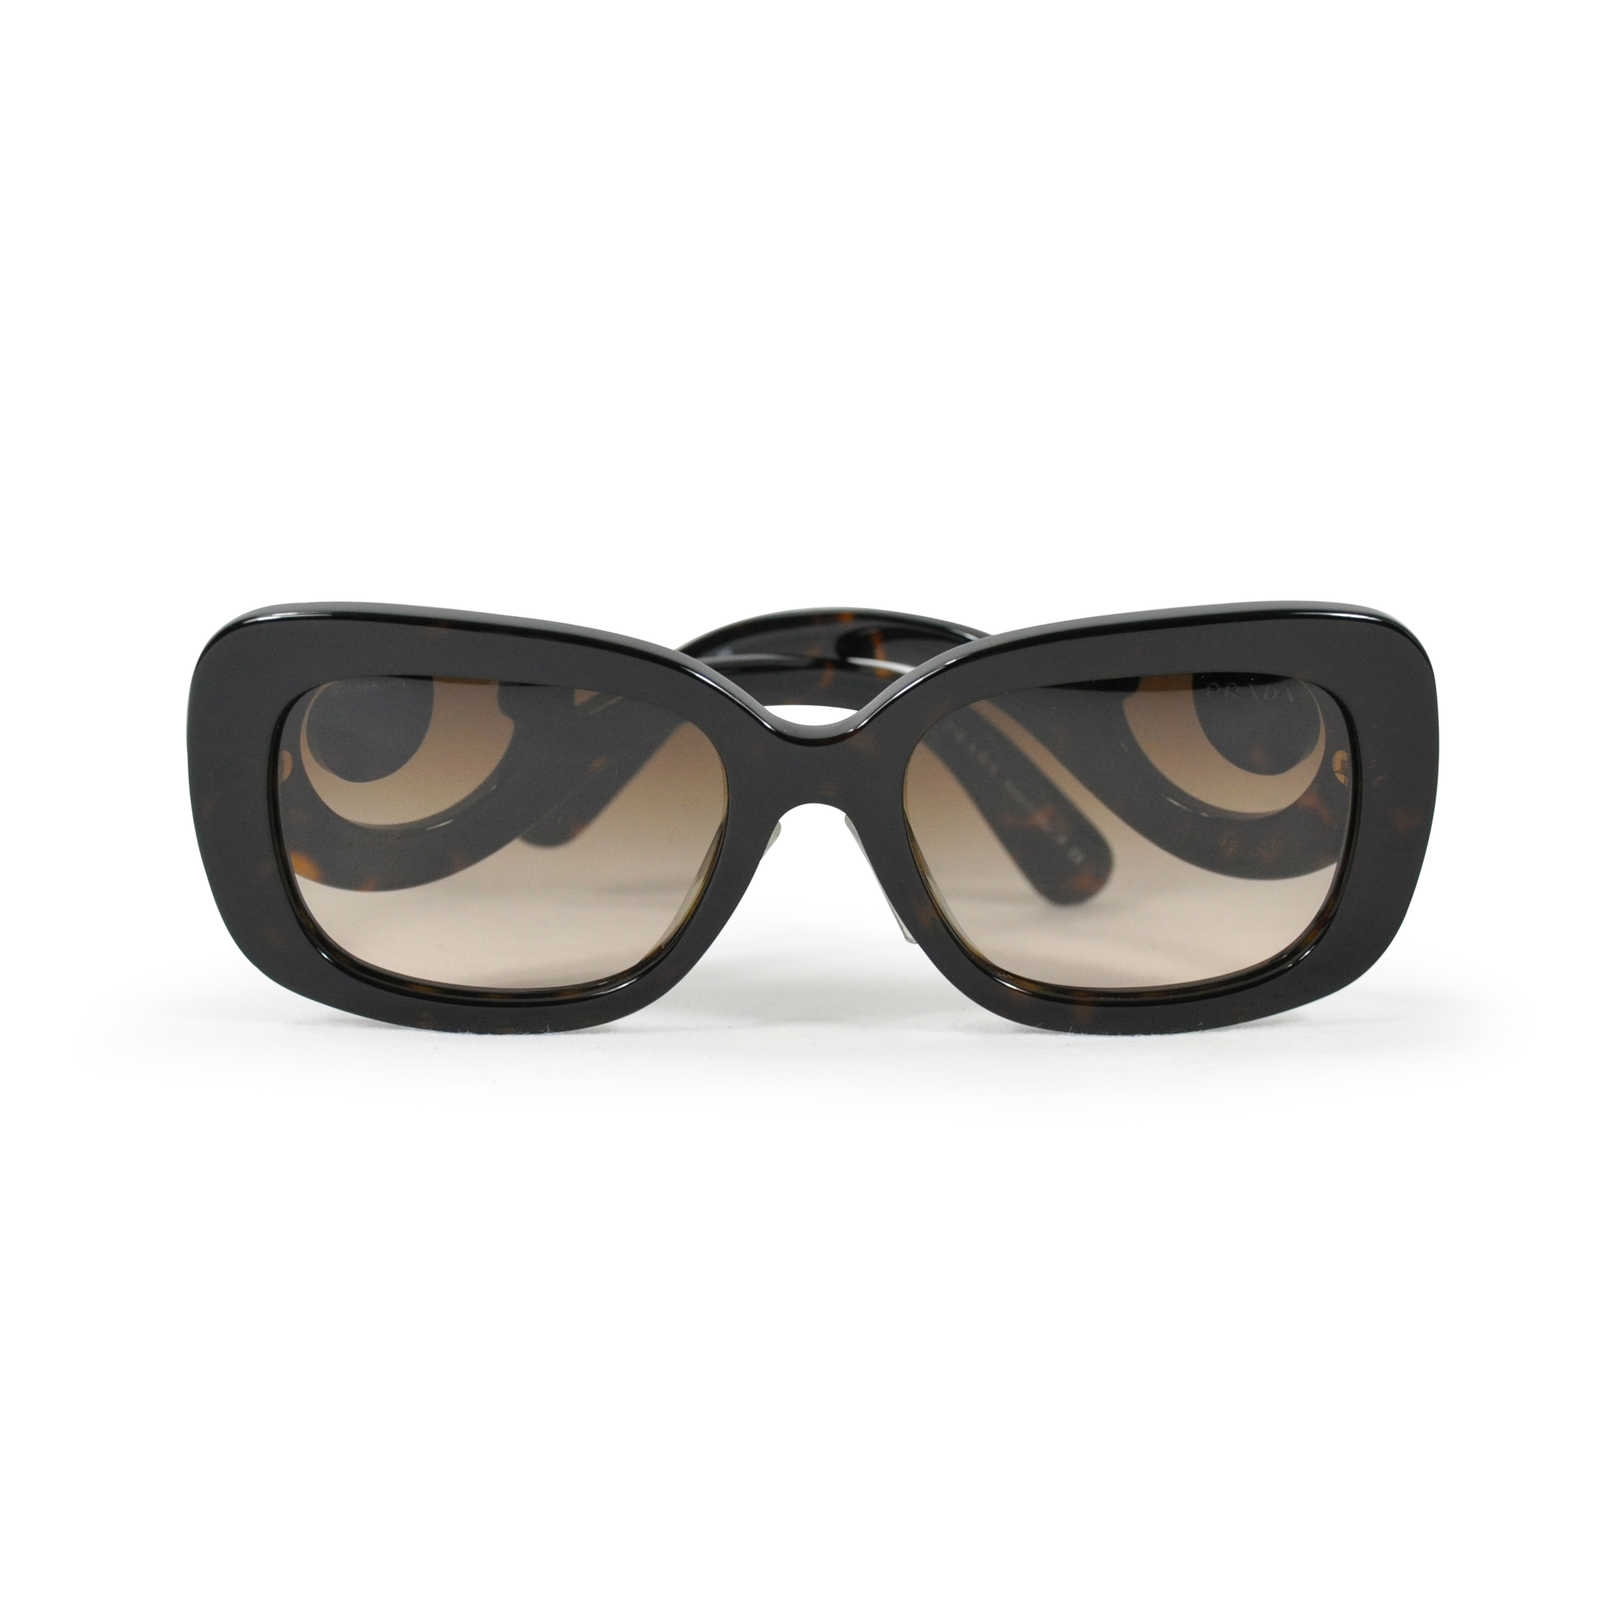 df04fceb91 ... spain authentic pre owned prada baroque square sunglasses pss 200 00395  thumbnail 31458 093ac